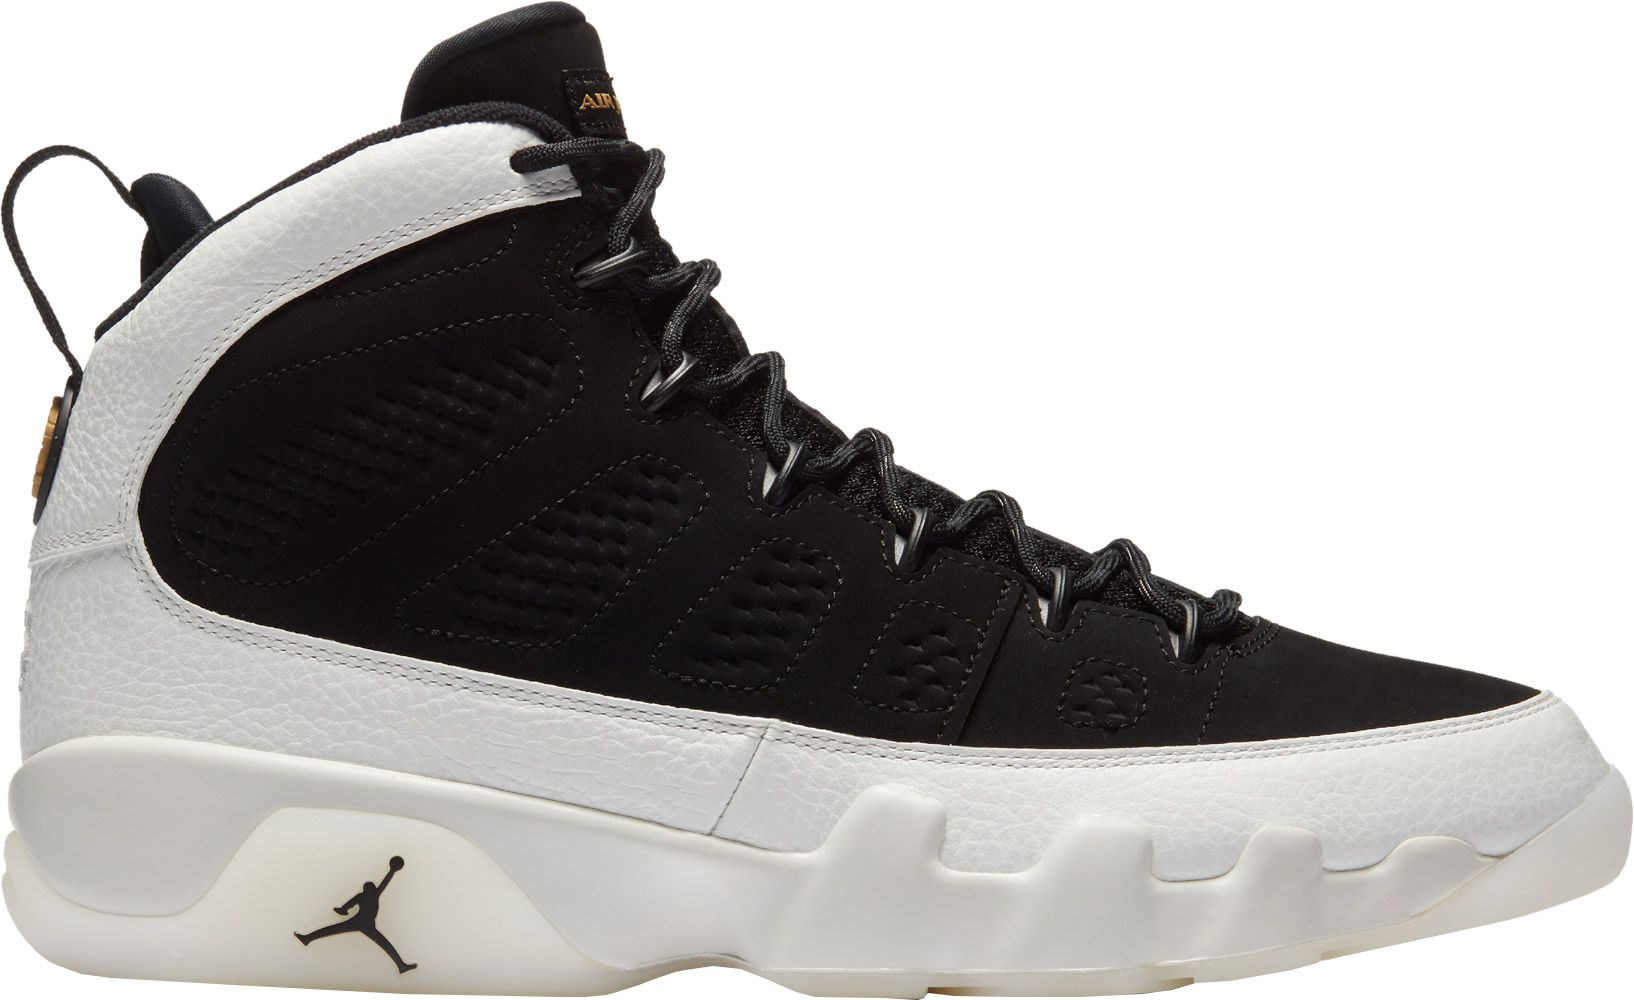 jordan shoes 4 /5y - 8 = 2 /5y + 16 personalities infp-a 808070